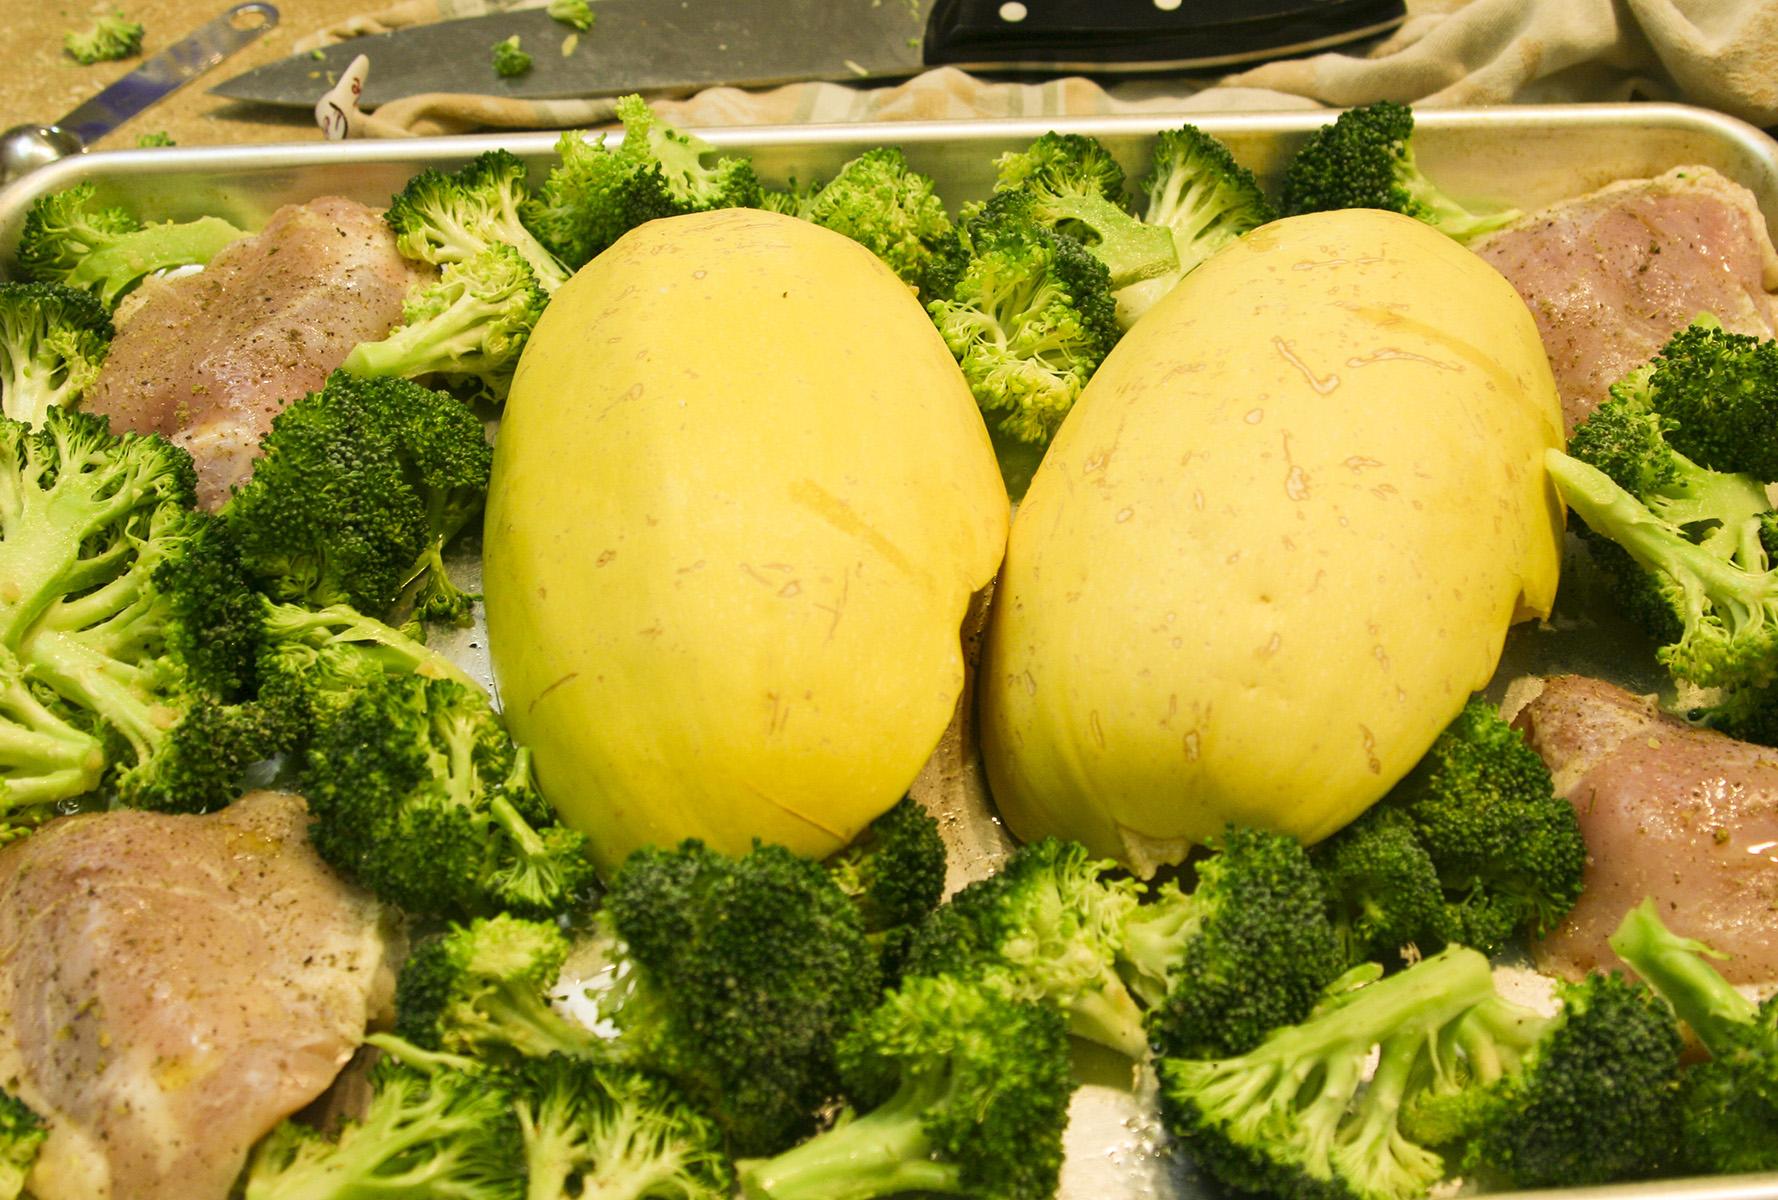 spaghetti squash broccoli and chicken on a baking sheet pan